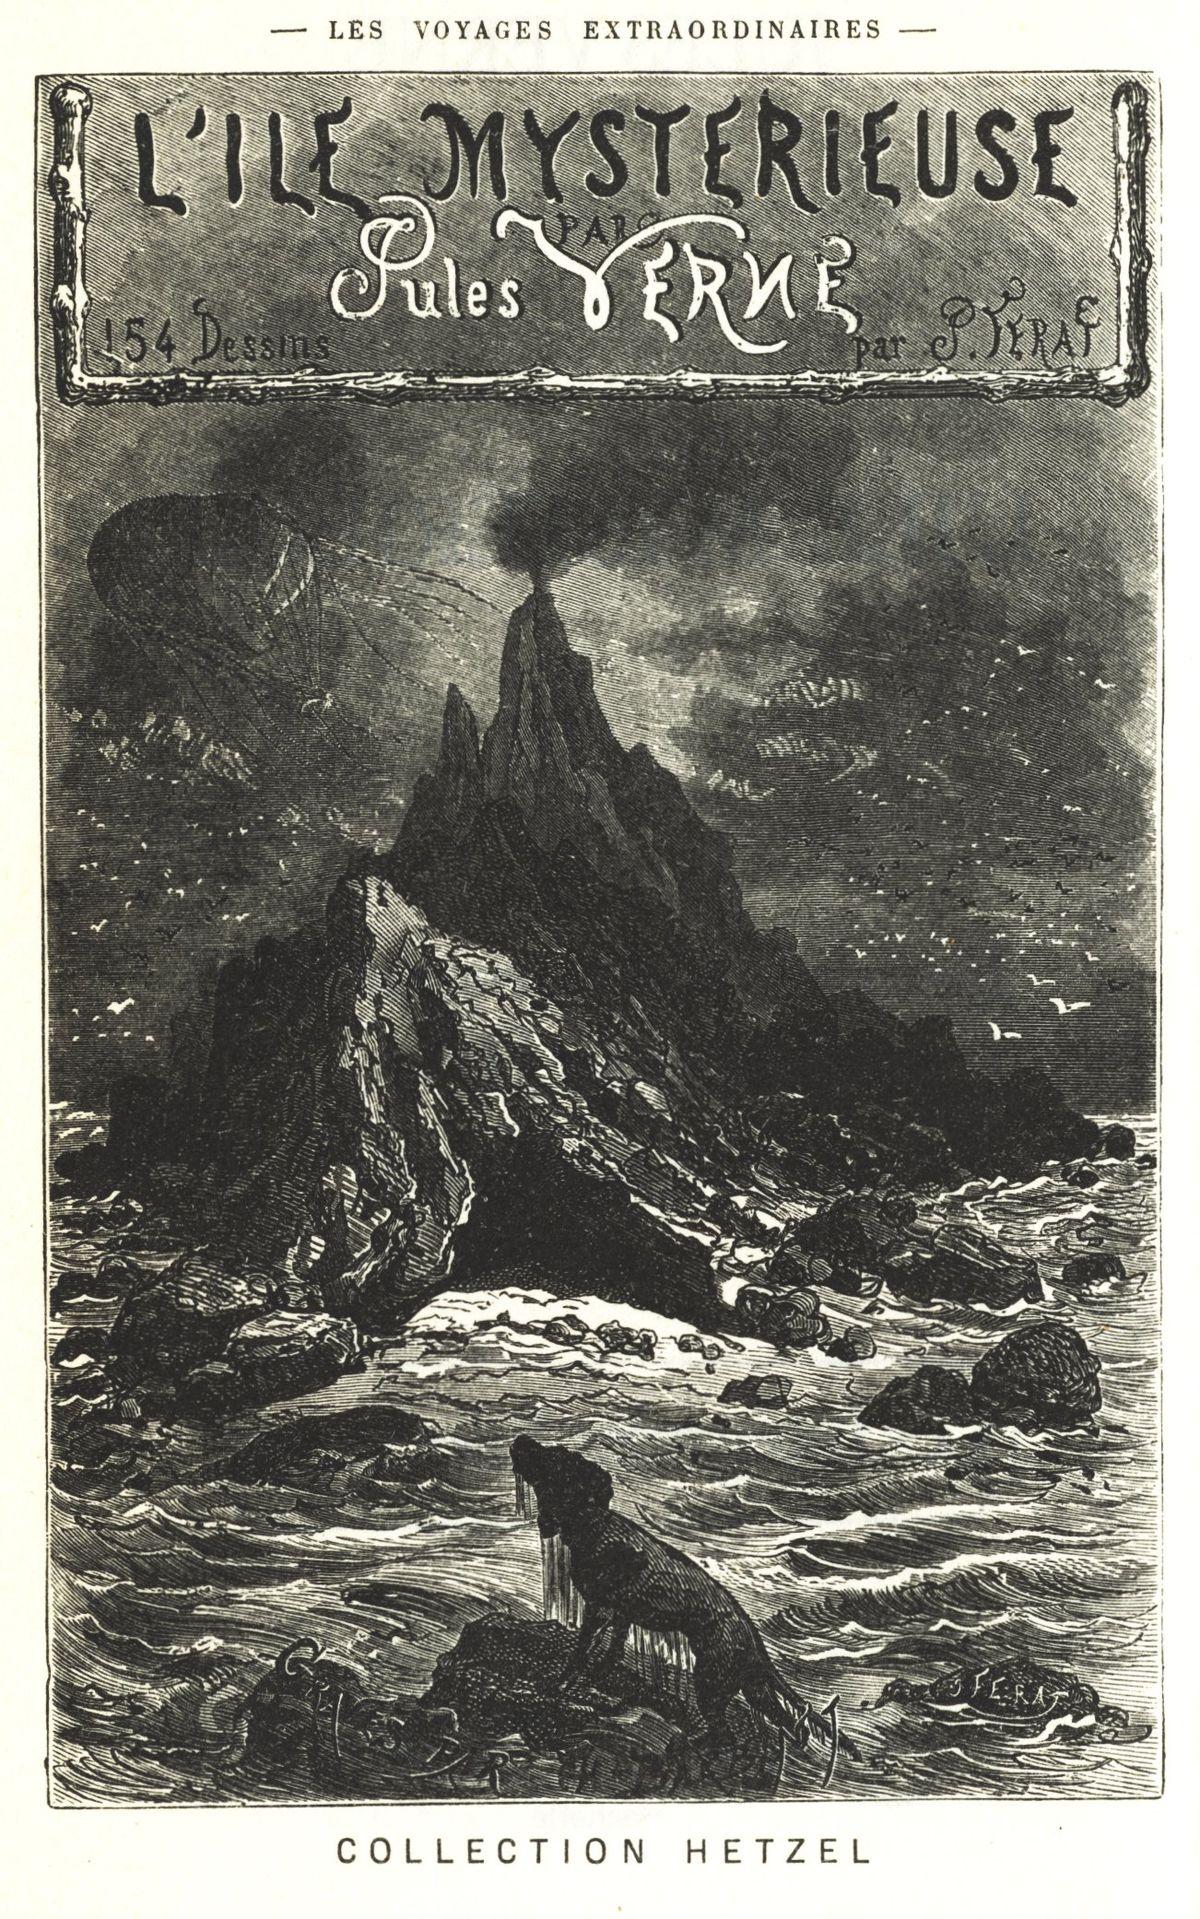 La isla misteriosa - Wikipedia, la enciclopedia libre